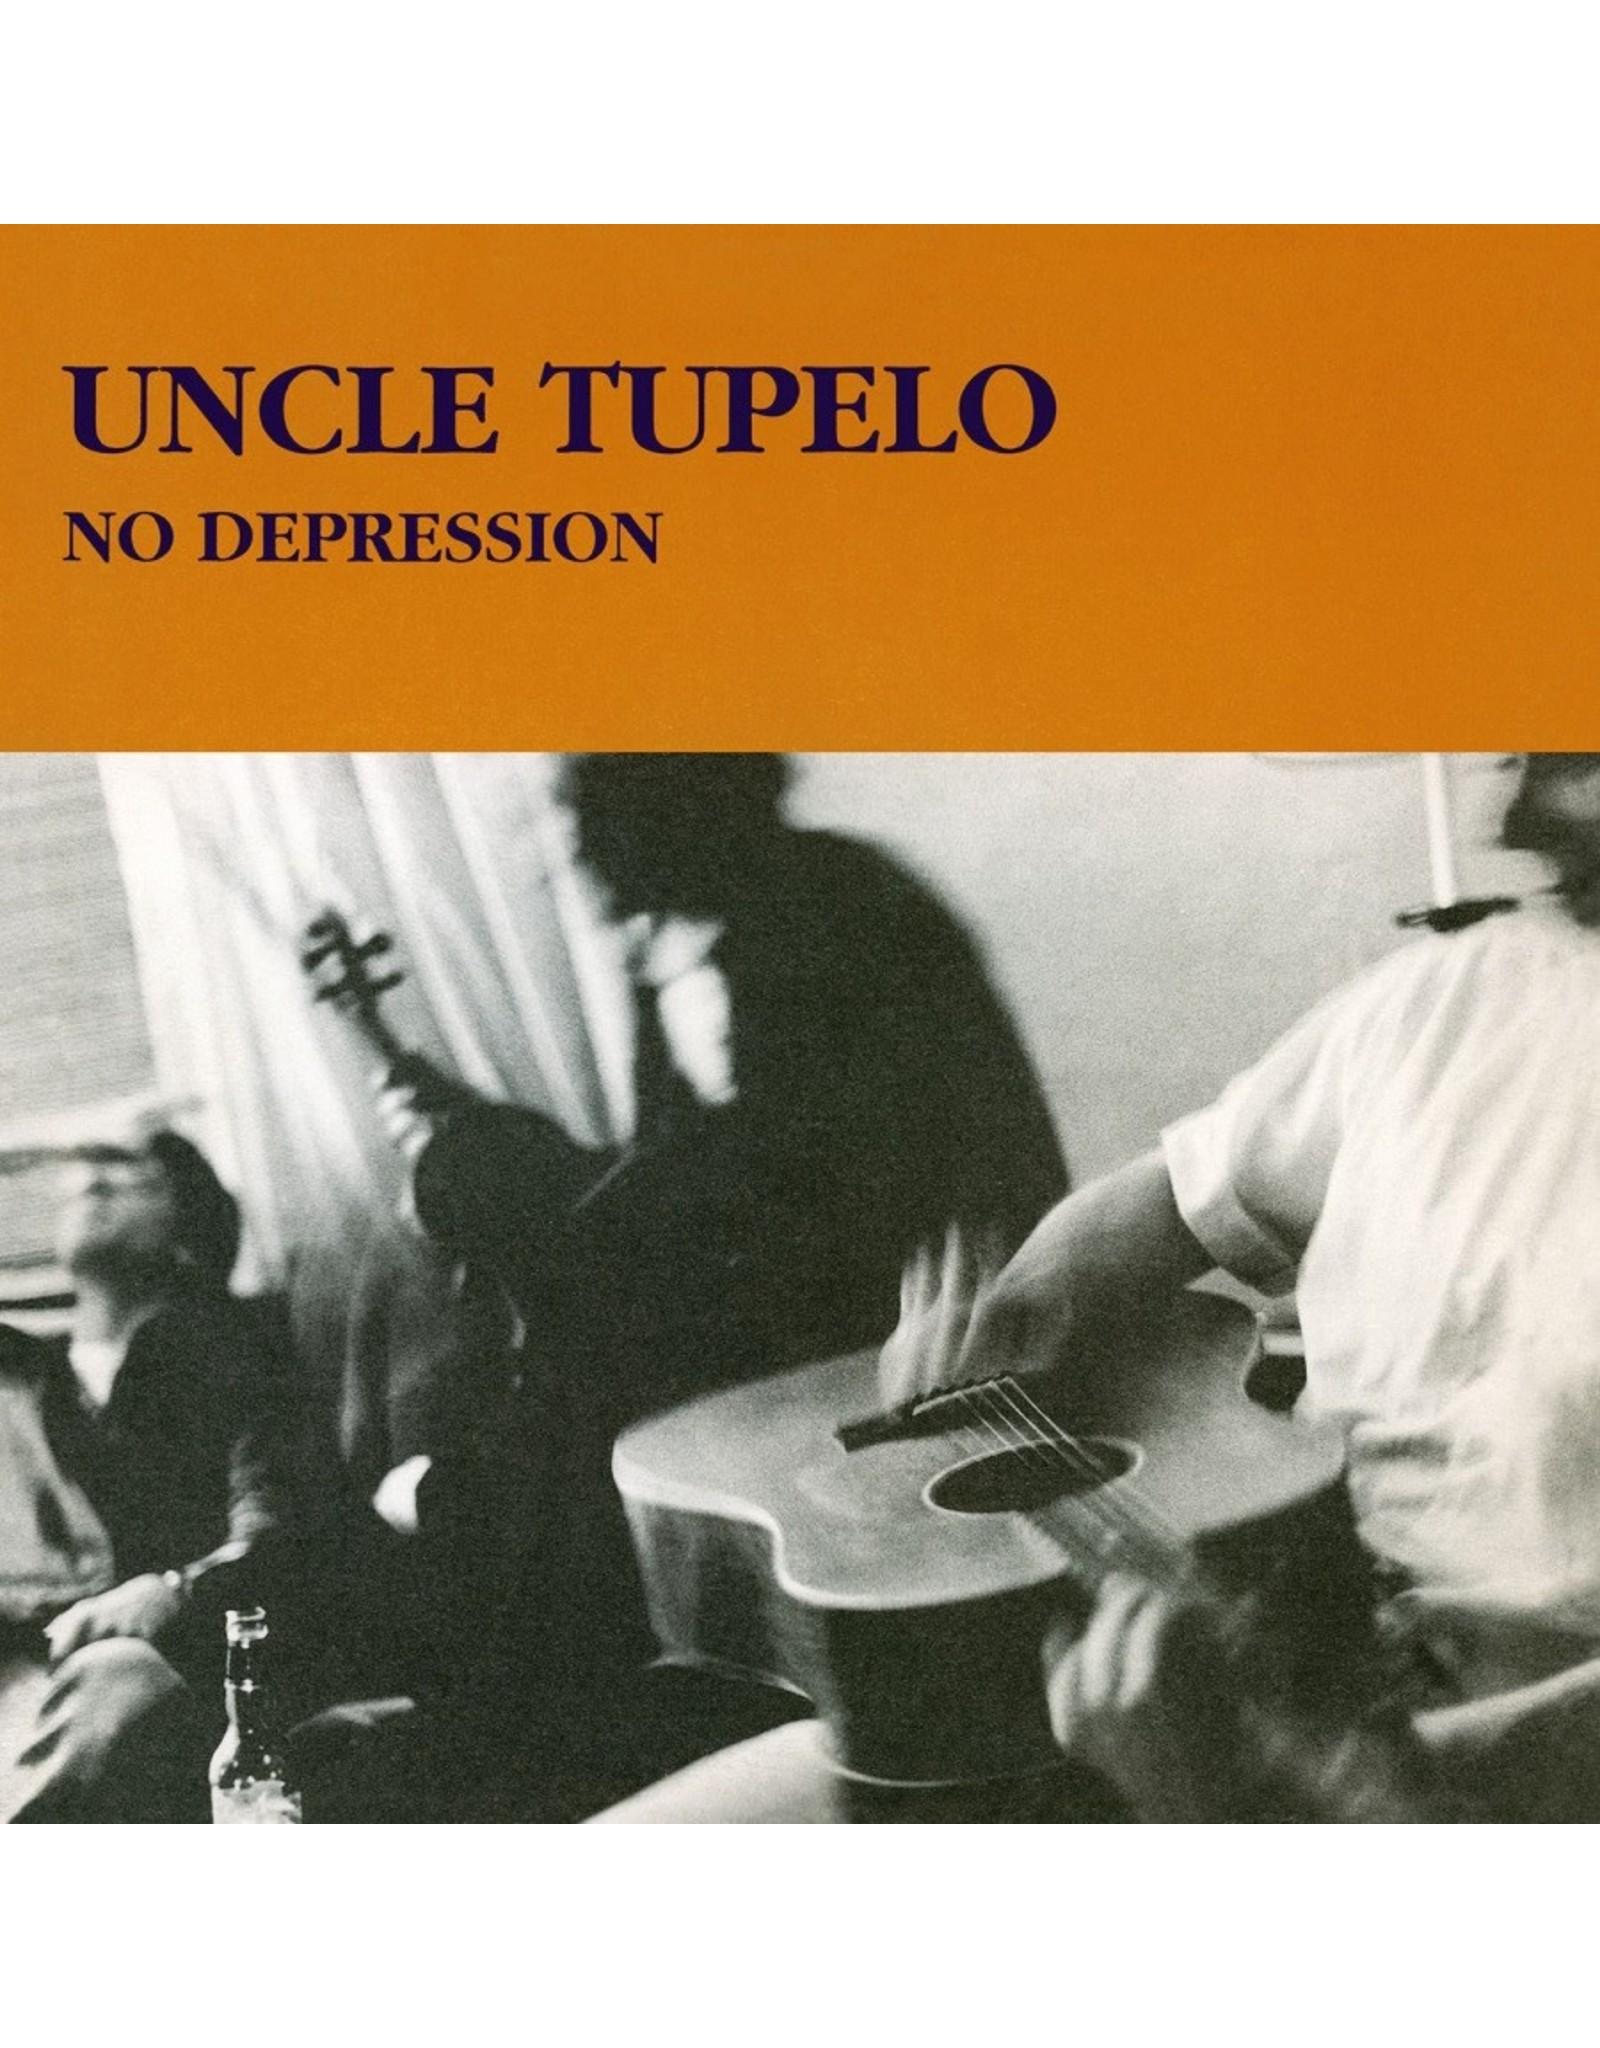 Uncle Tupelo - No Depression (Ltd. 1500 Copies/Crystal Clear Vinyl) LP